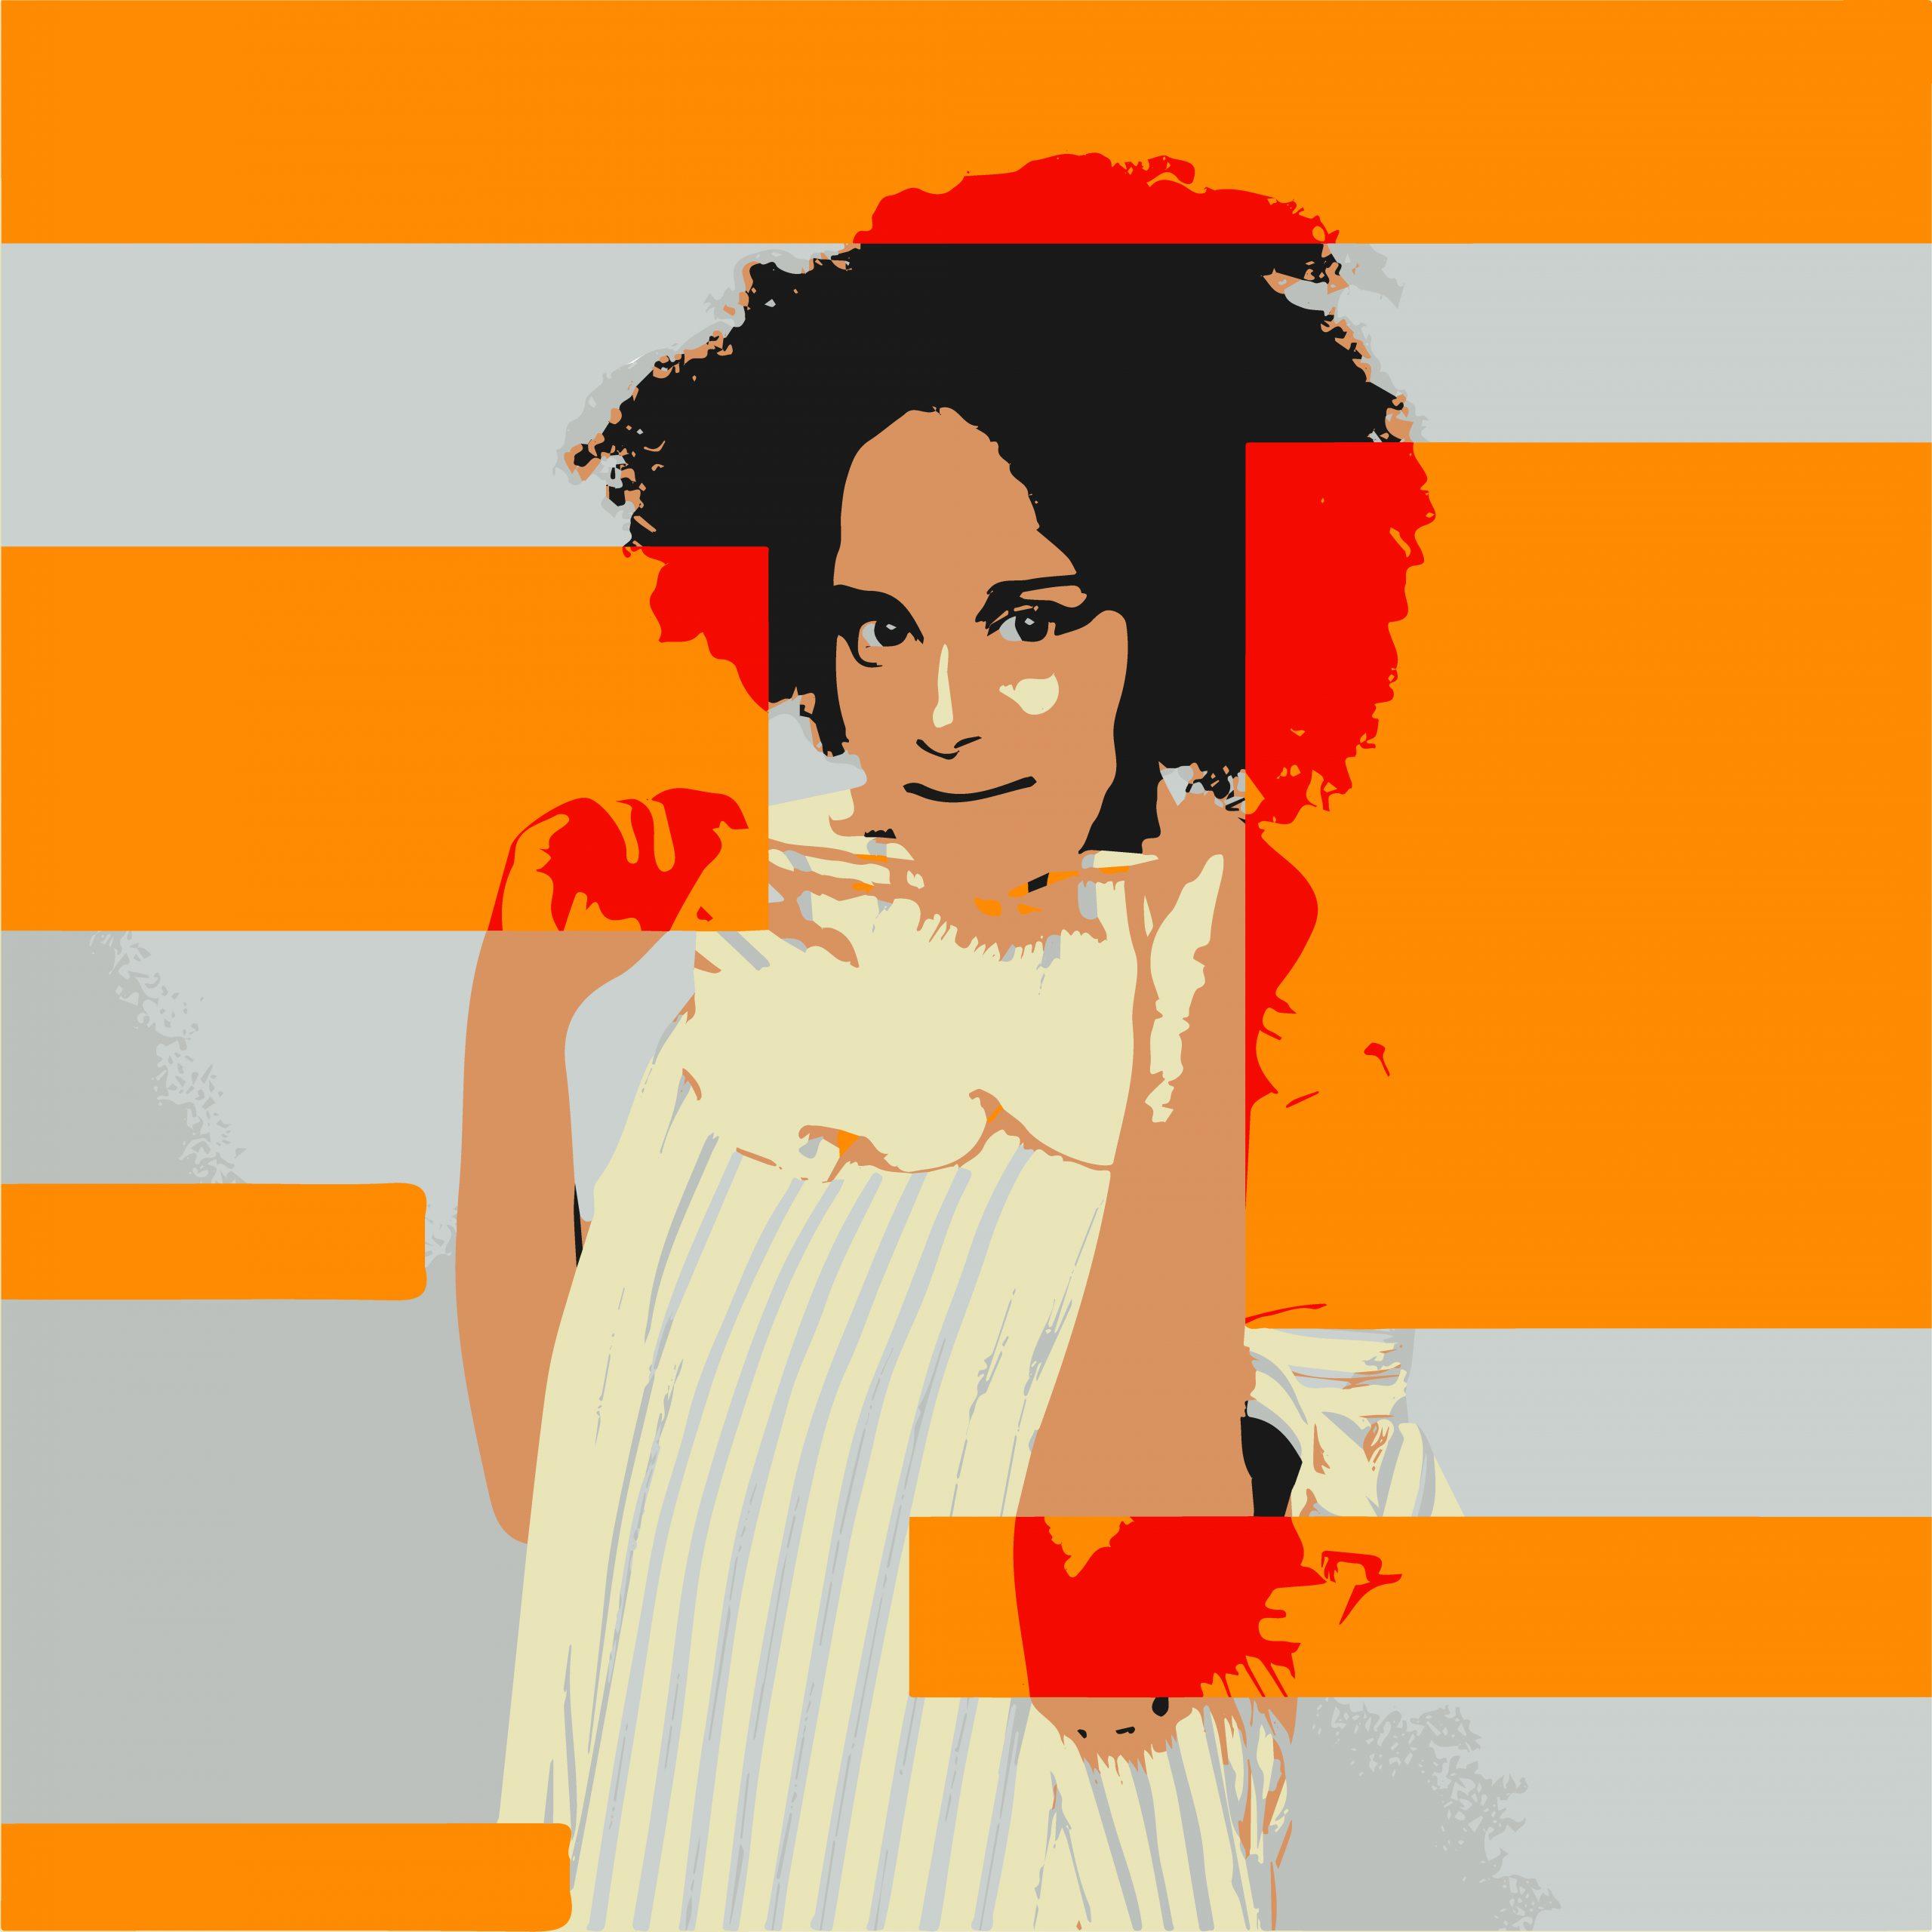 Portrait illustration of a girl